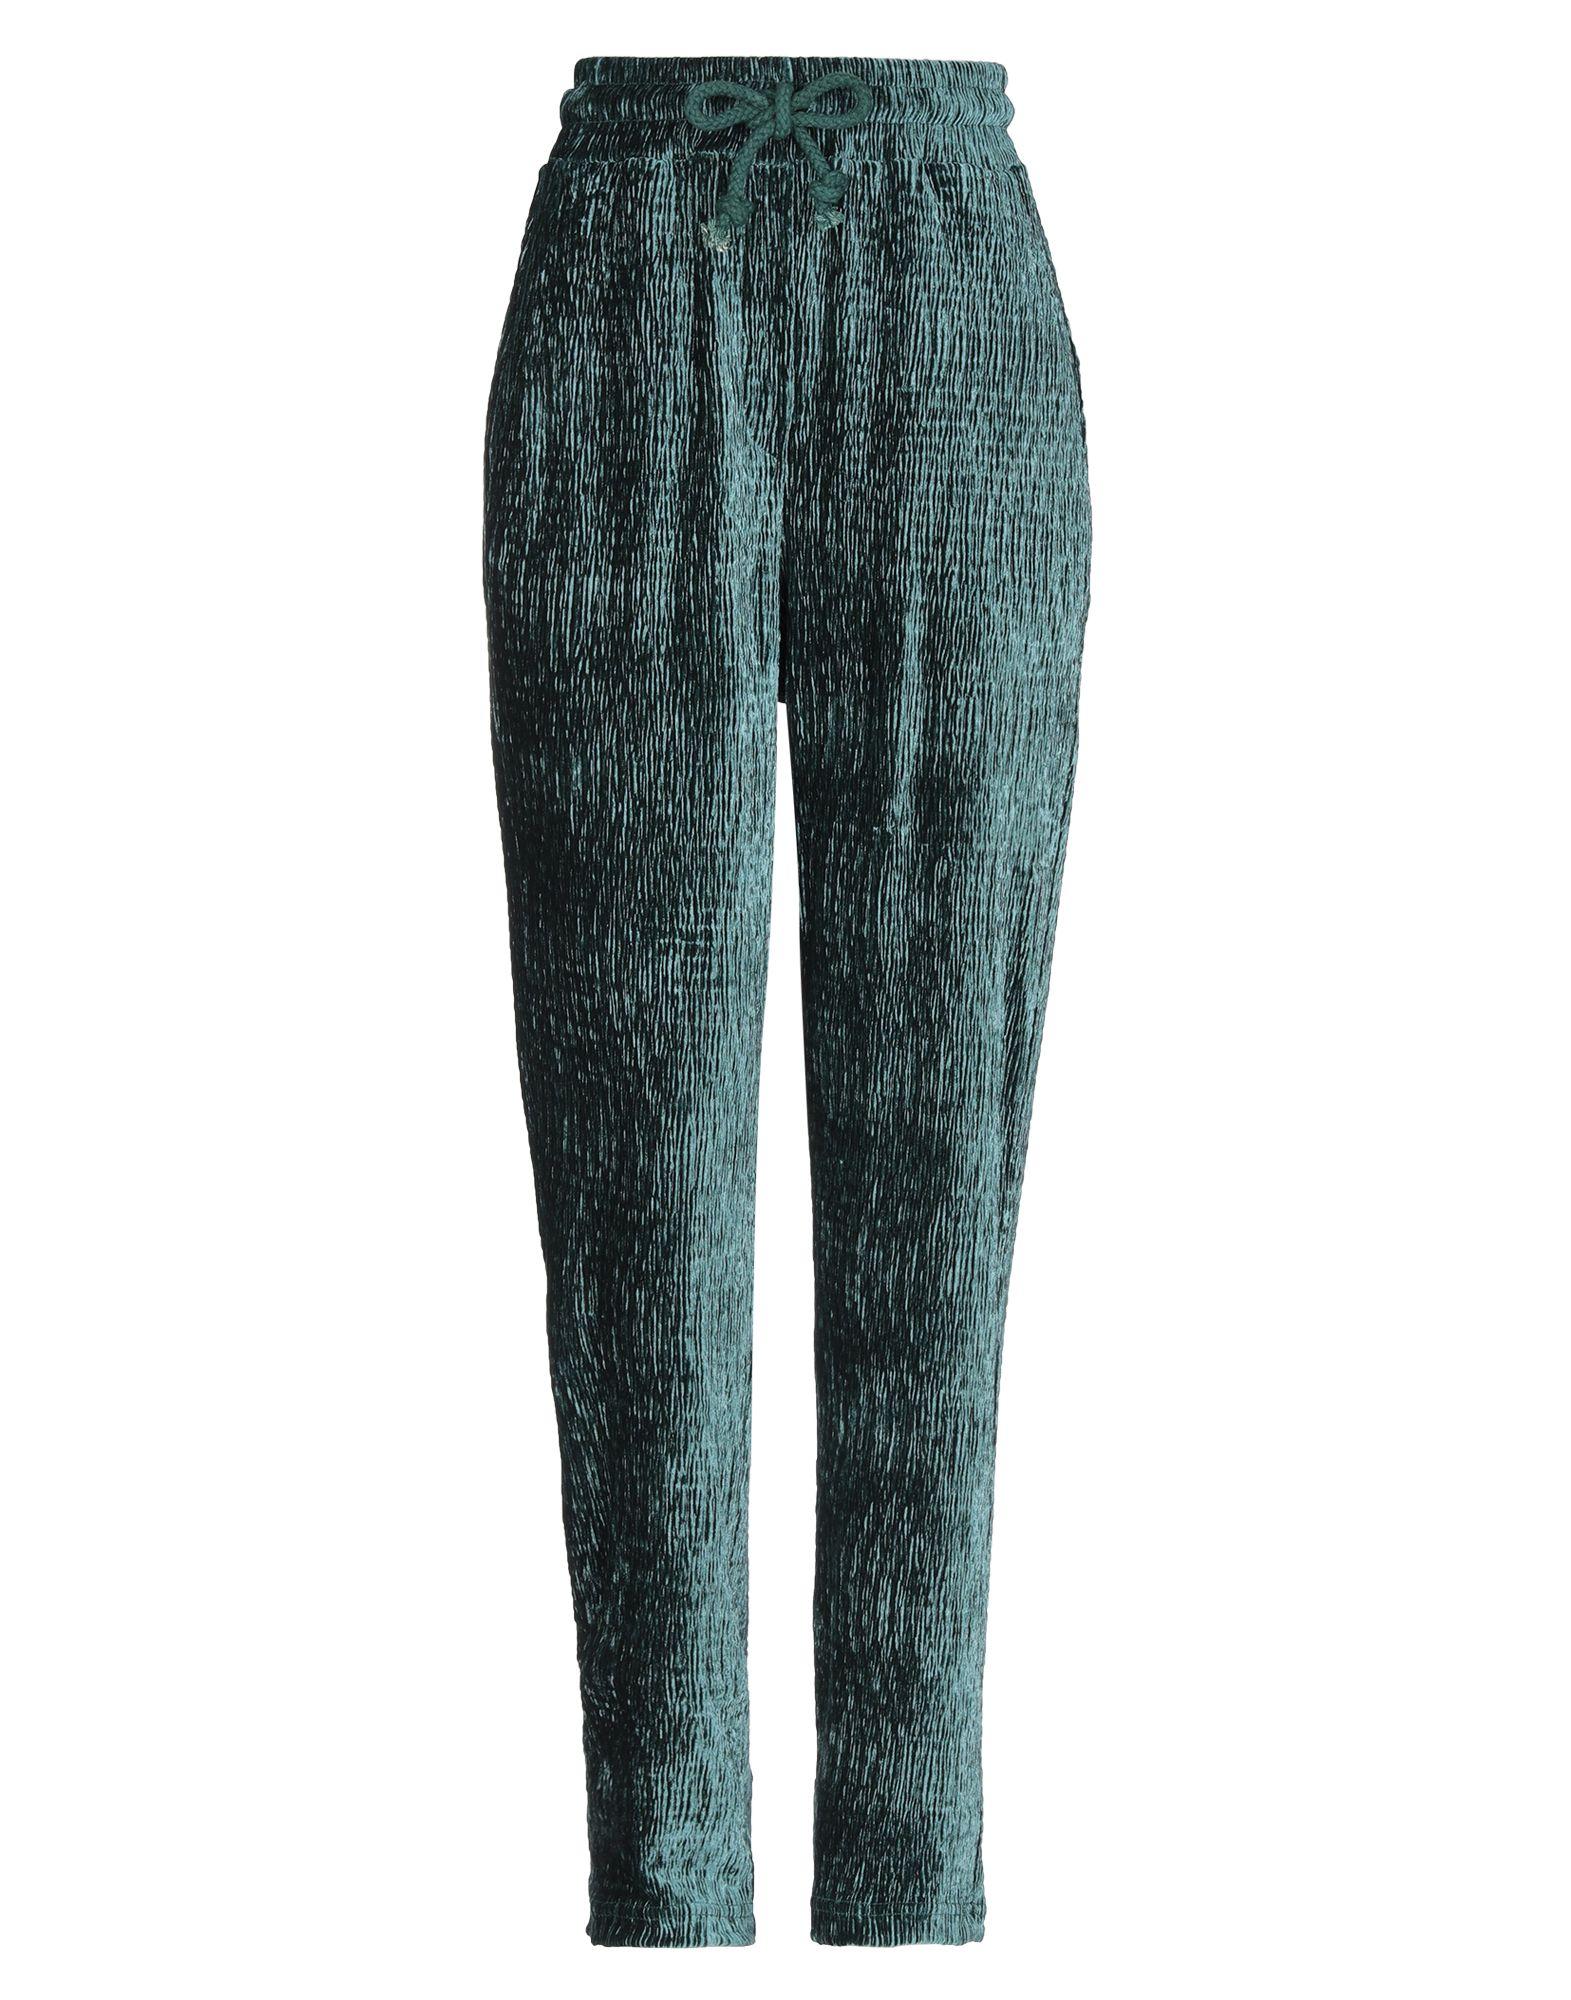 KATE BY LALTRAMODA Повседневные брюки kate by laltramoda пиджак